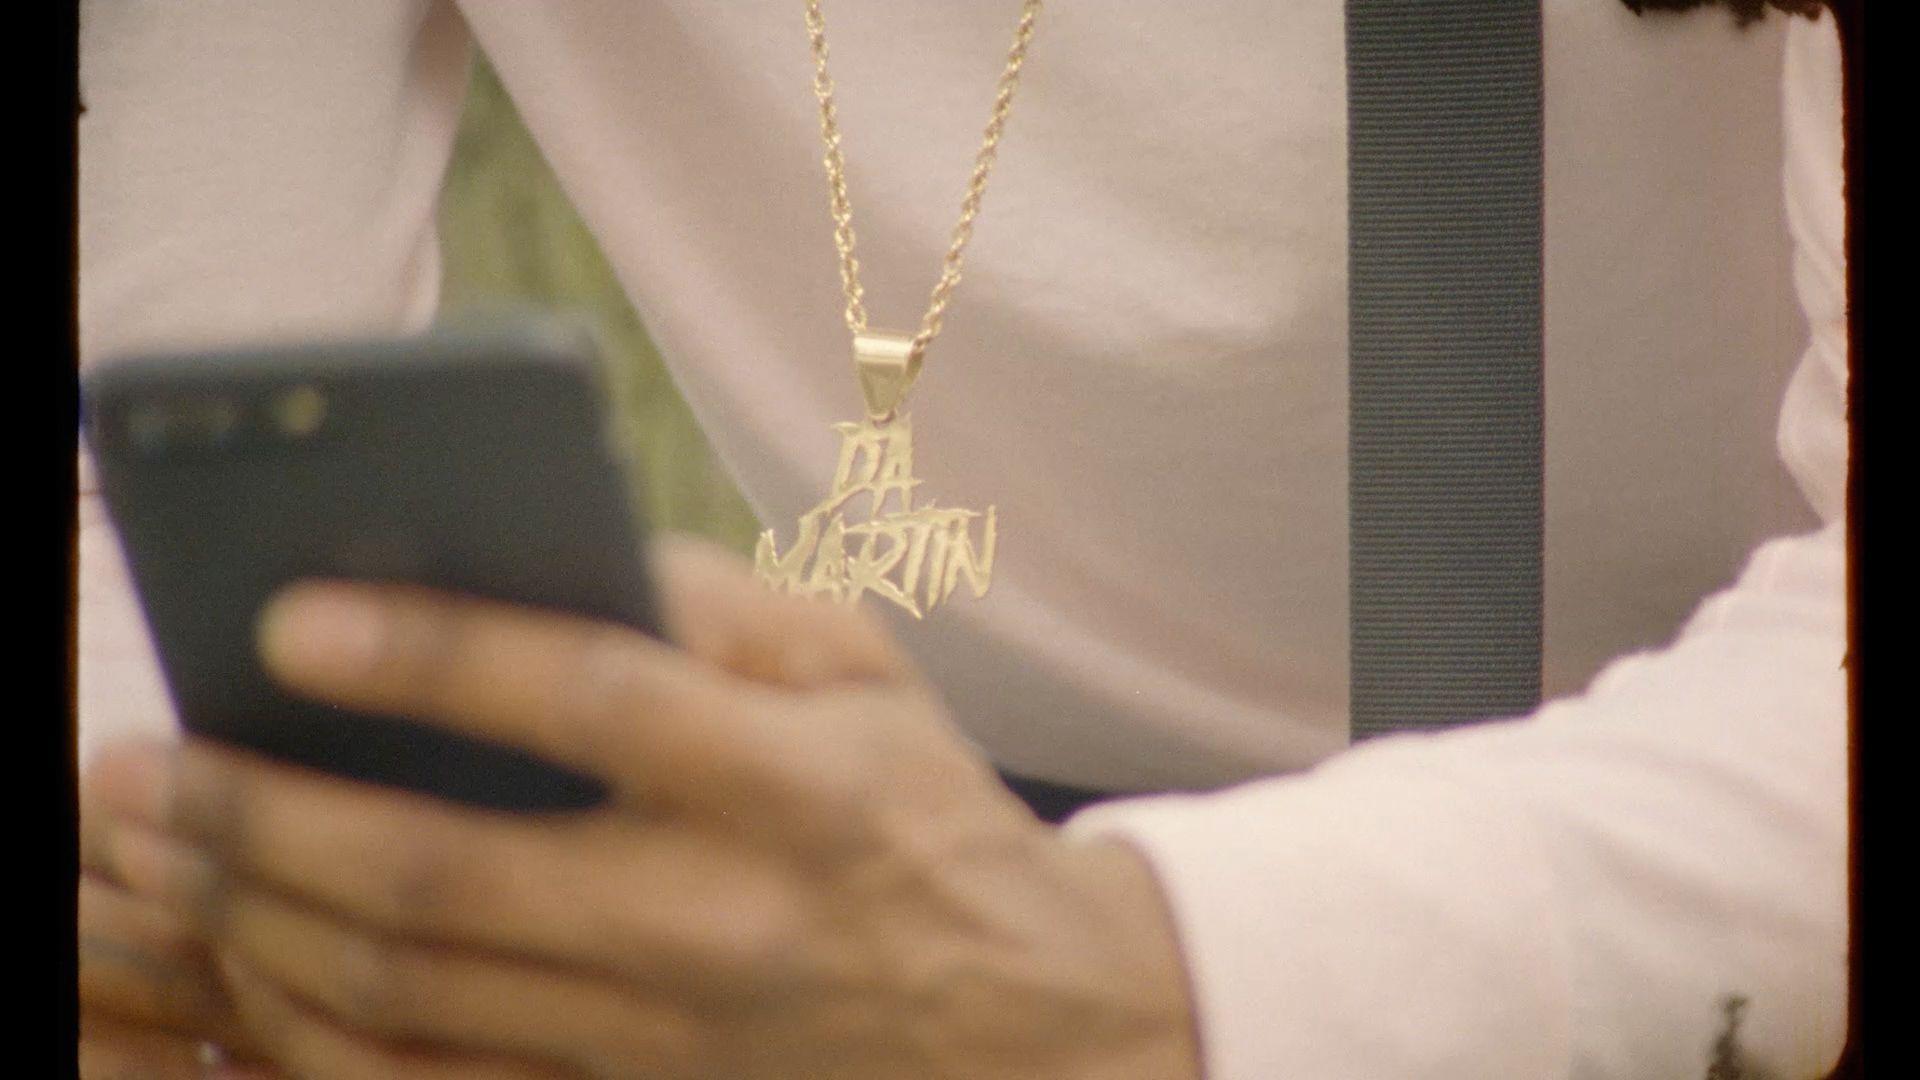 Nate Husser rap singer gold chain in video La Beatmakerie filmed by Les Gamins